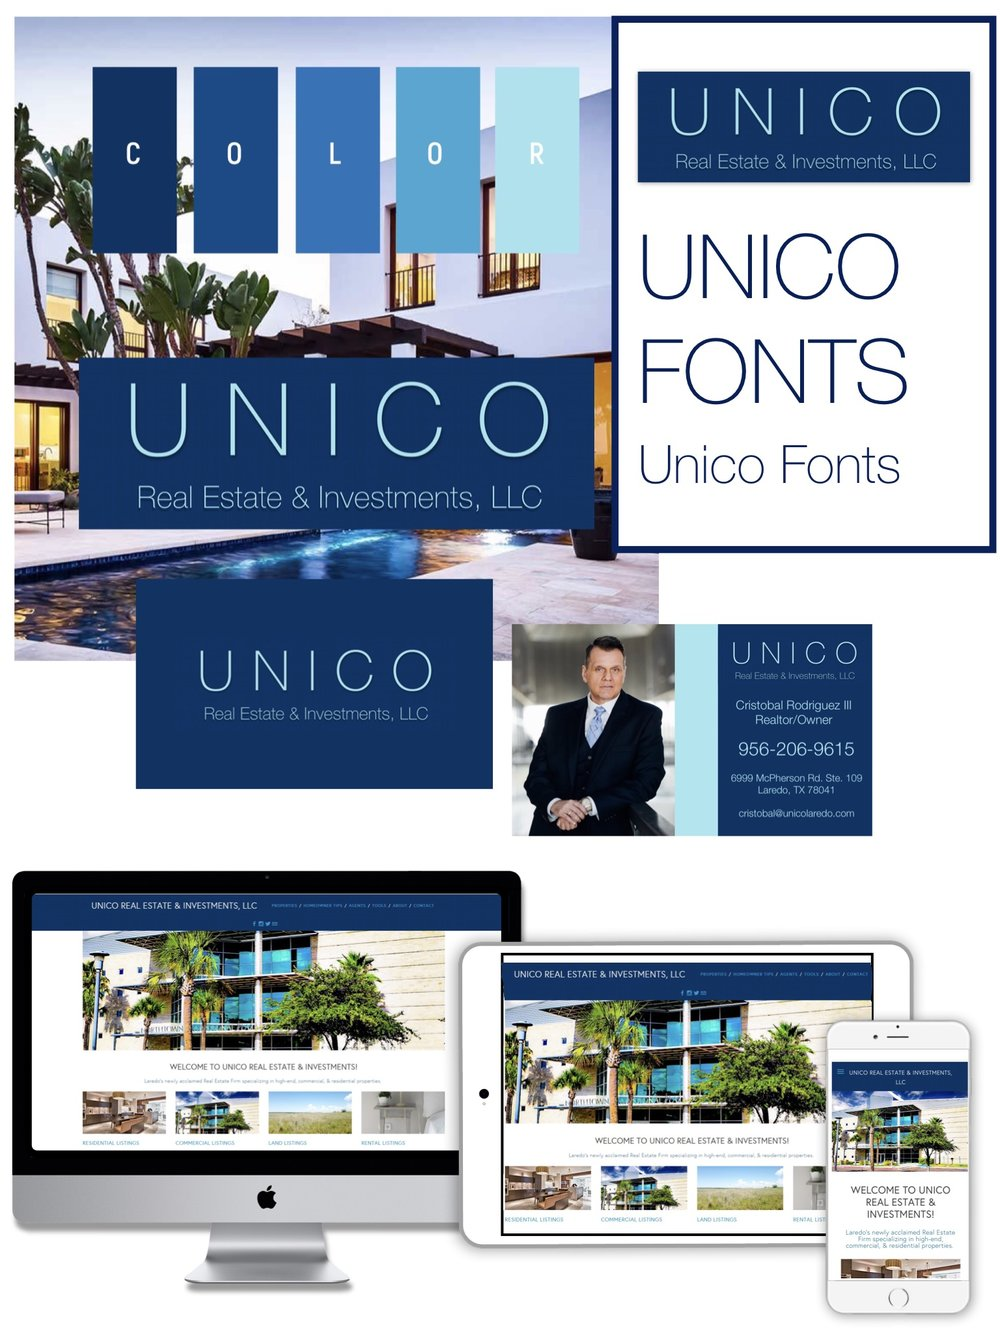 UNICO_WEBSITE-BRANDING.JPG